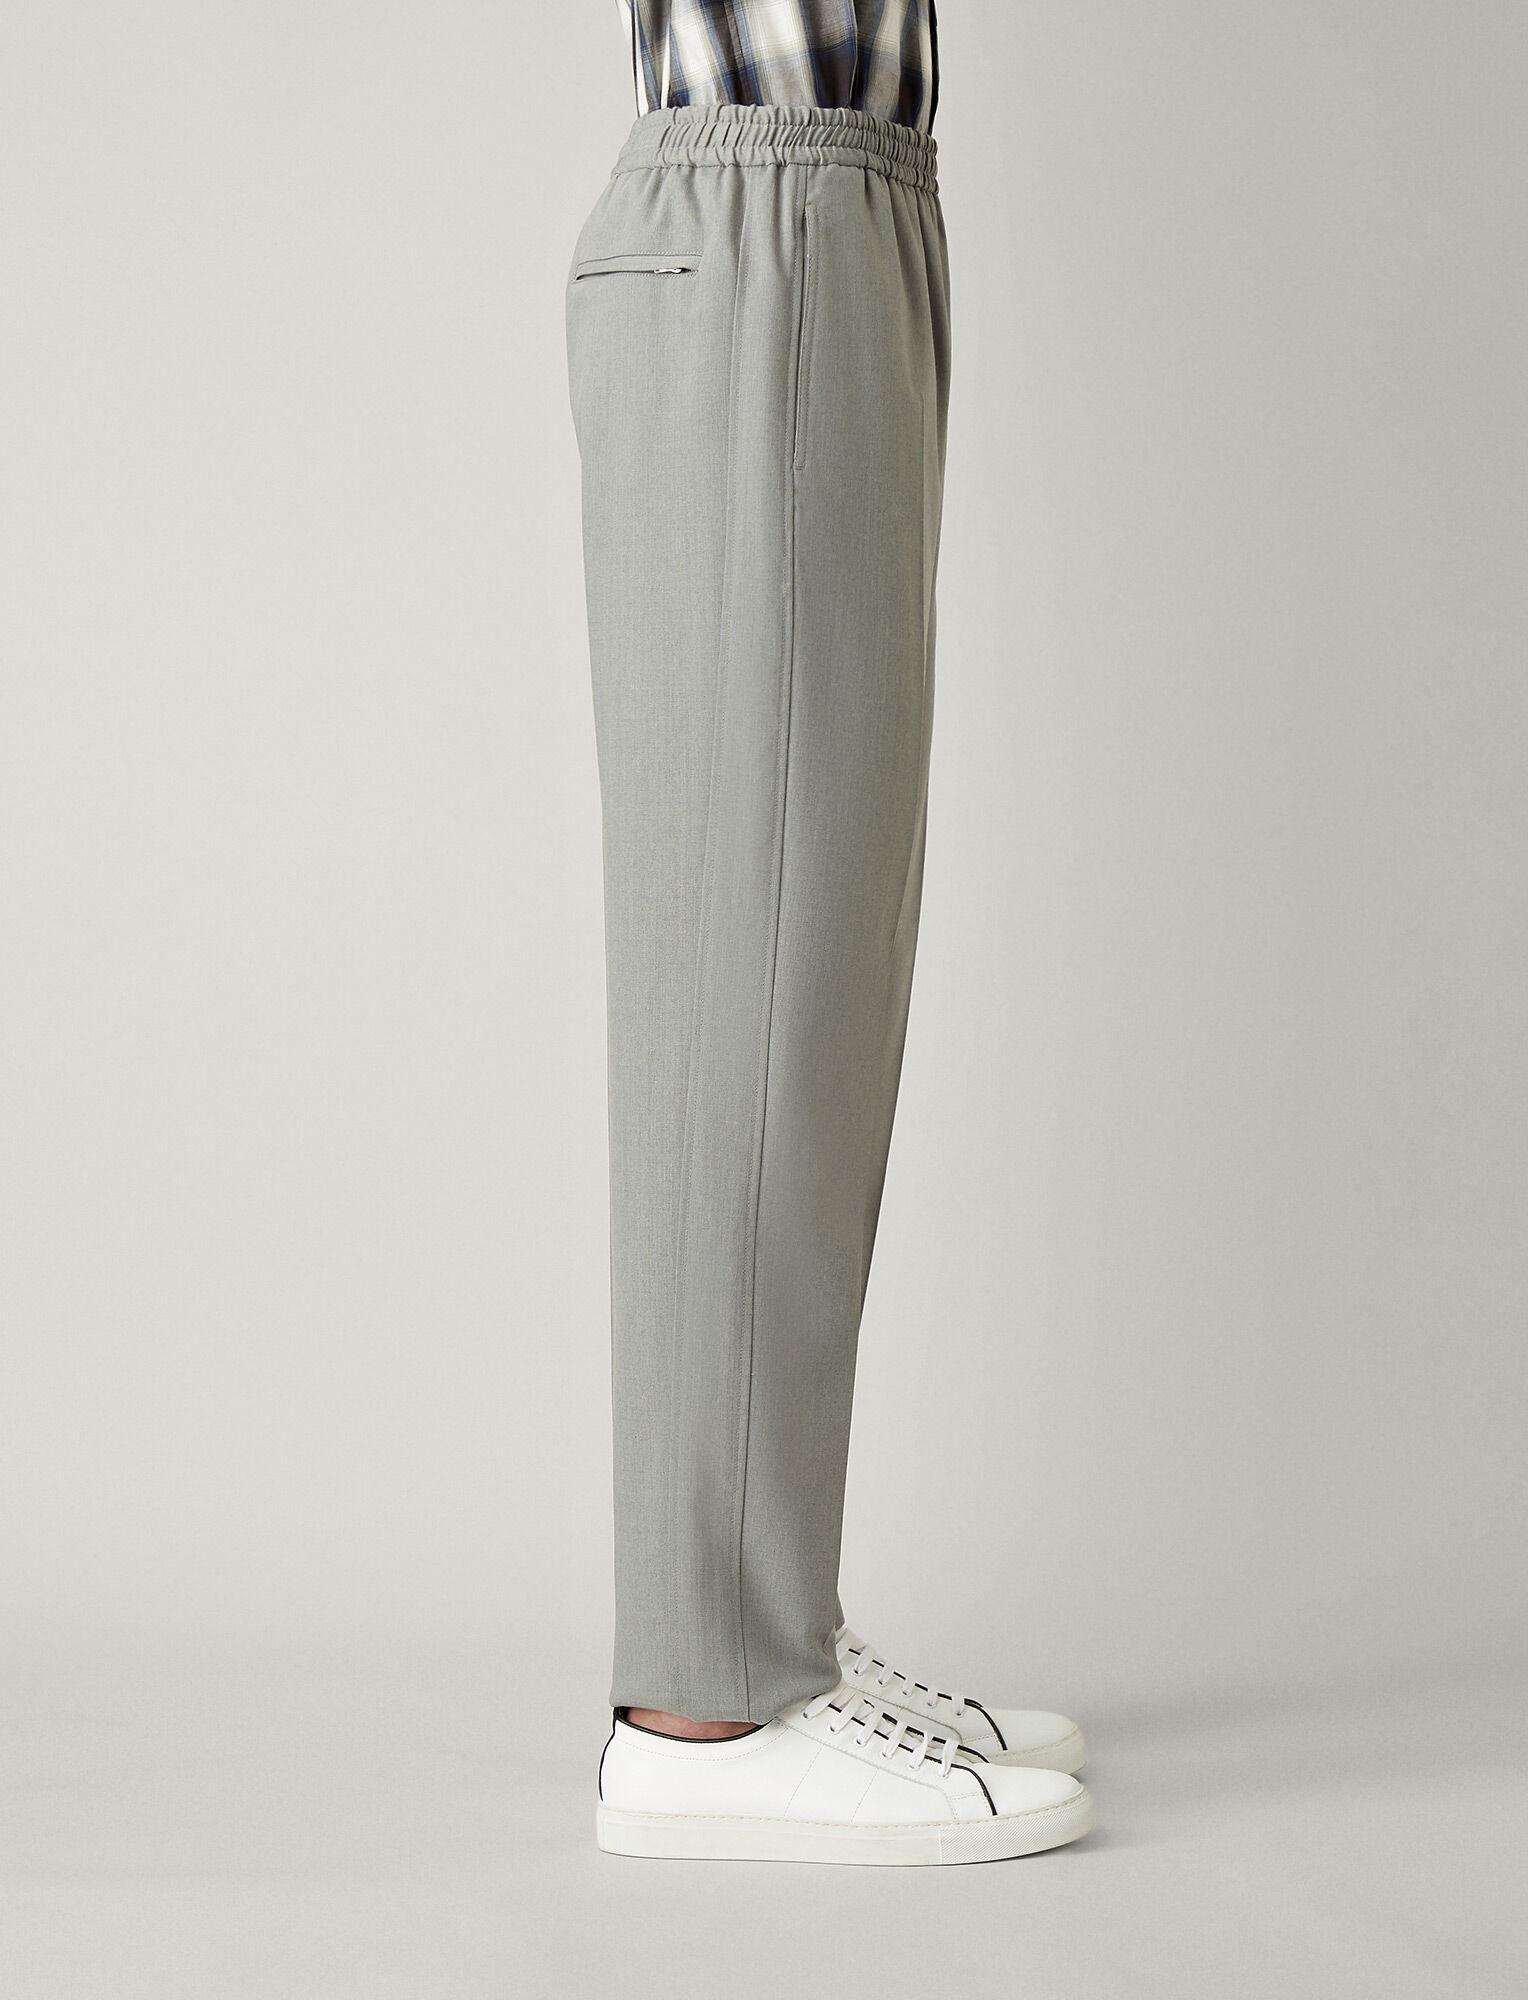 Joseph, Pantalon Ettrick en laine confort fine, in GREY CHINE